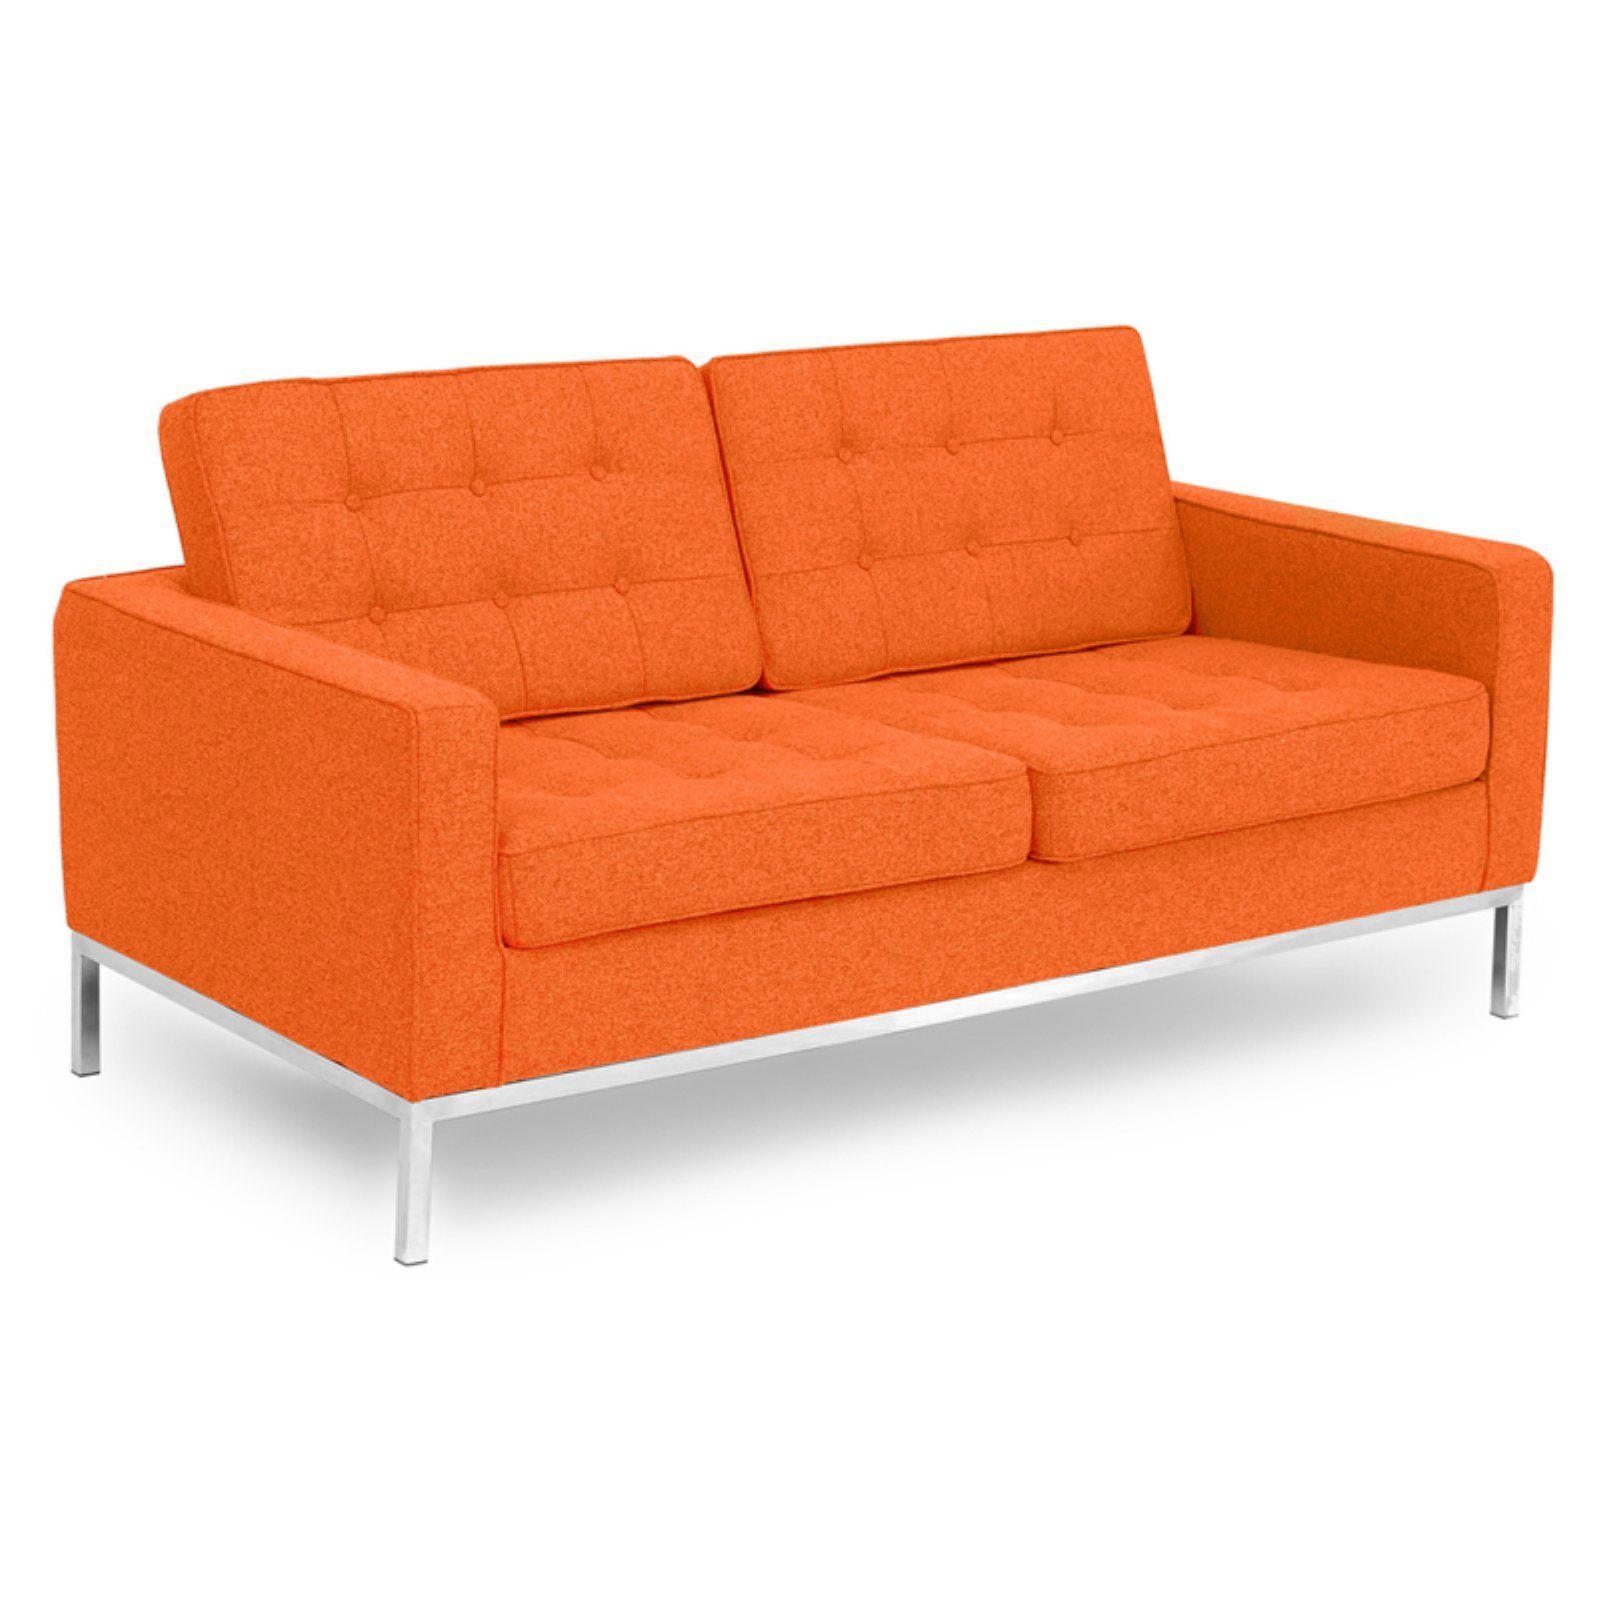 Kardiel Florence Knoll Fabric Sofa Cinnabar Love Seat Fabric